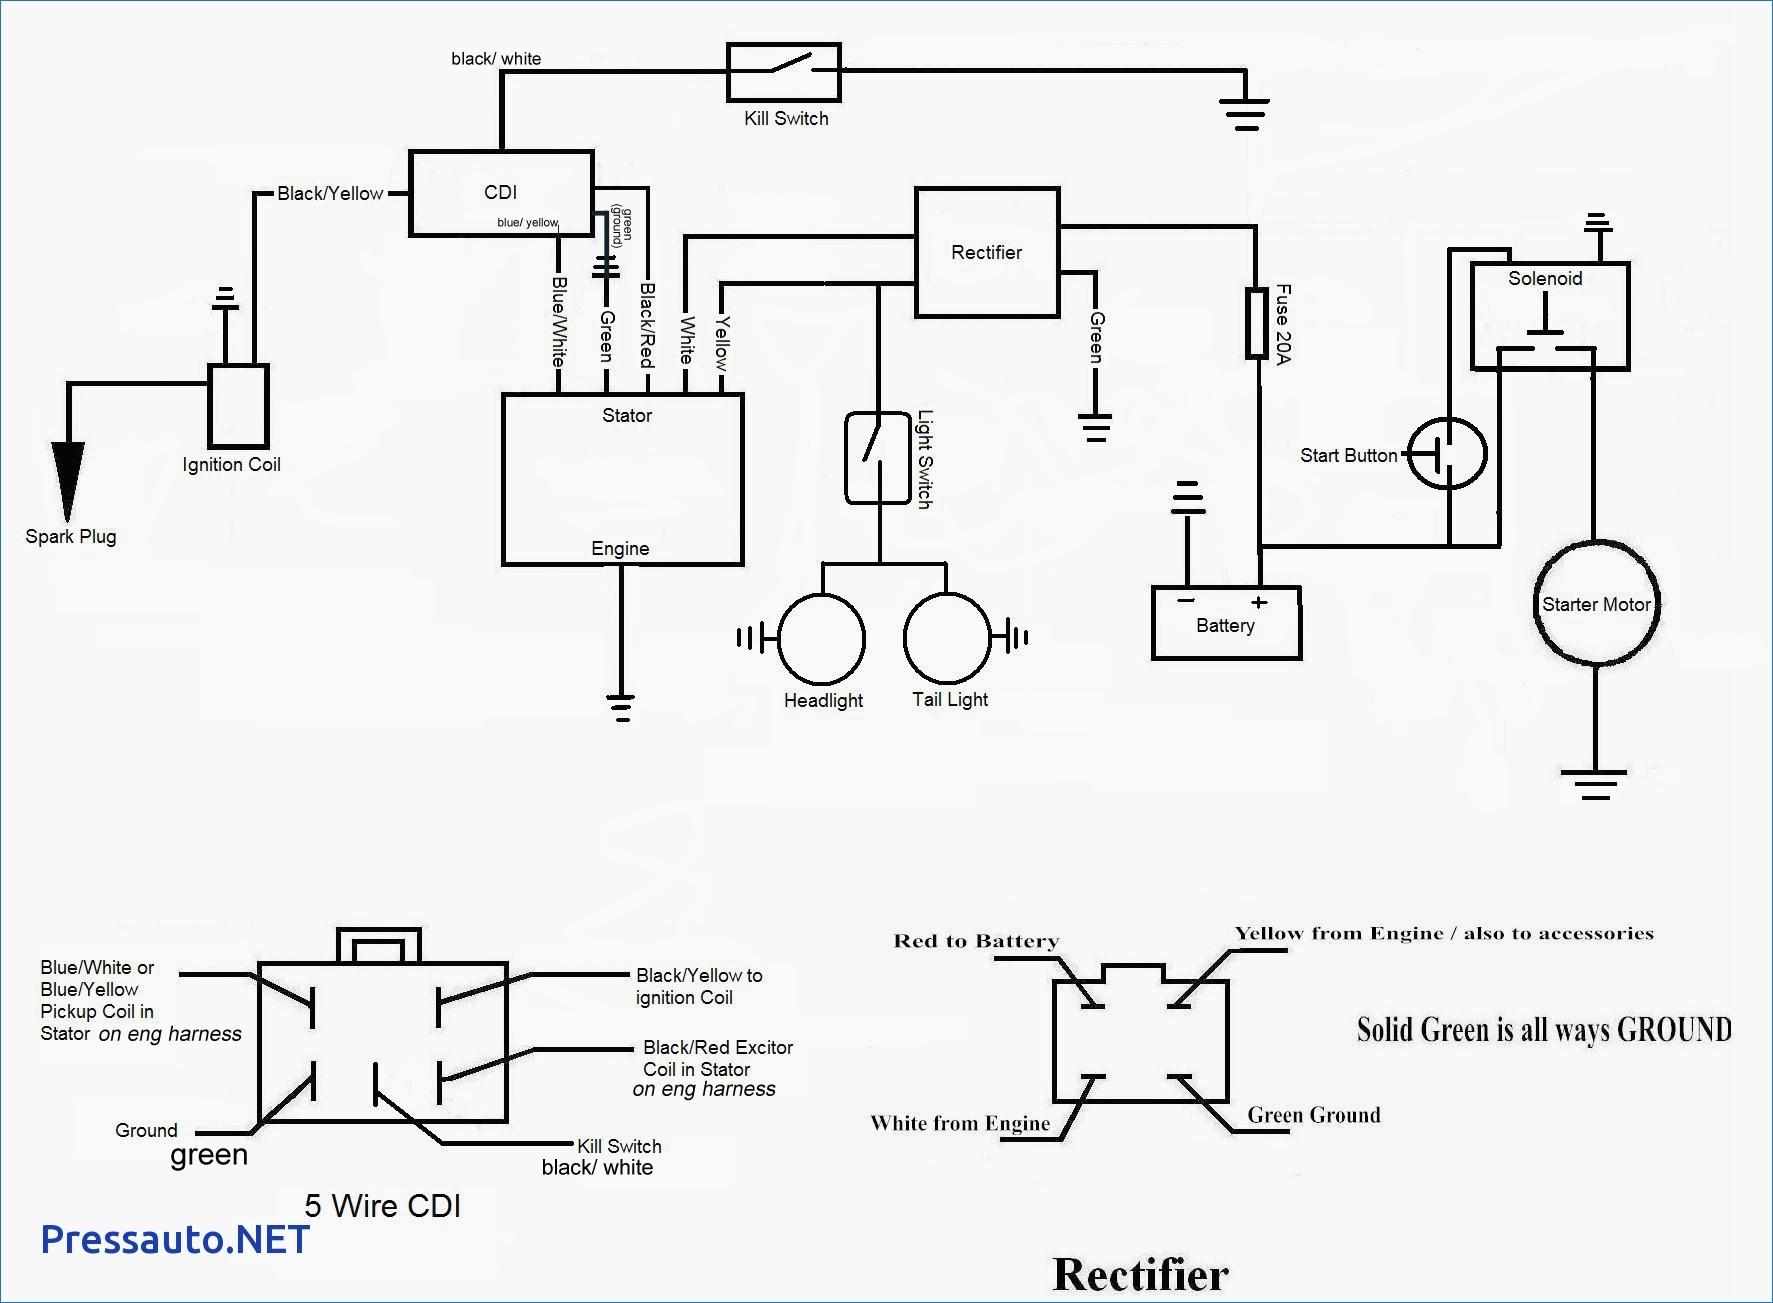 hight resolution of 110 pit bike wiring diagram 110 pit bike wiring diagram 110 atv wiring diagram besides